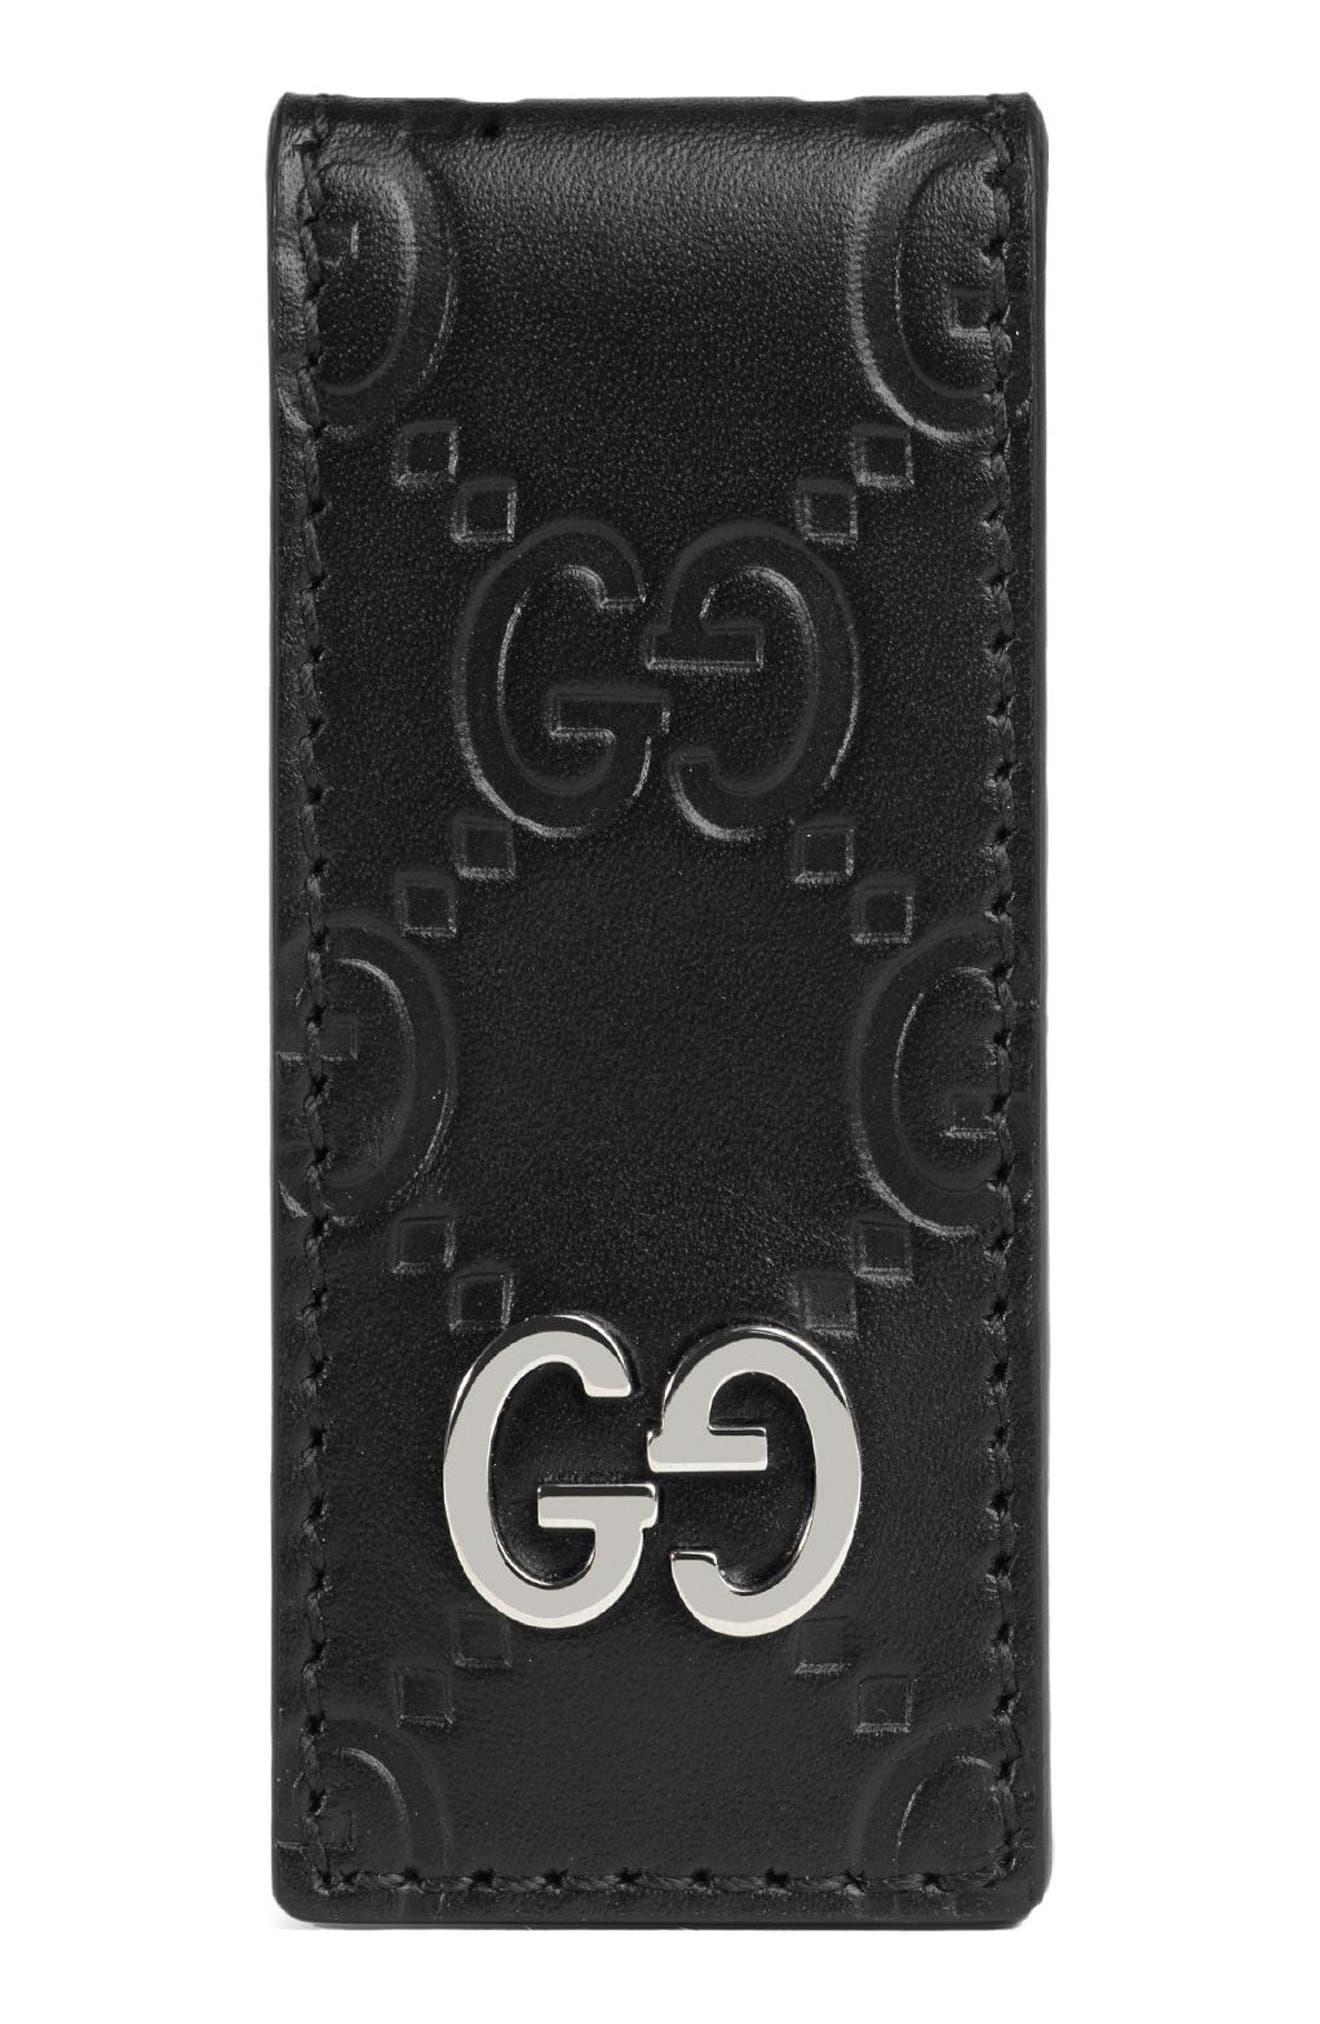 GG Signature Leather Money Clip,                             Main thumbnail 1, color,                             001